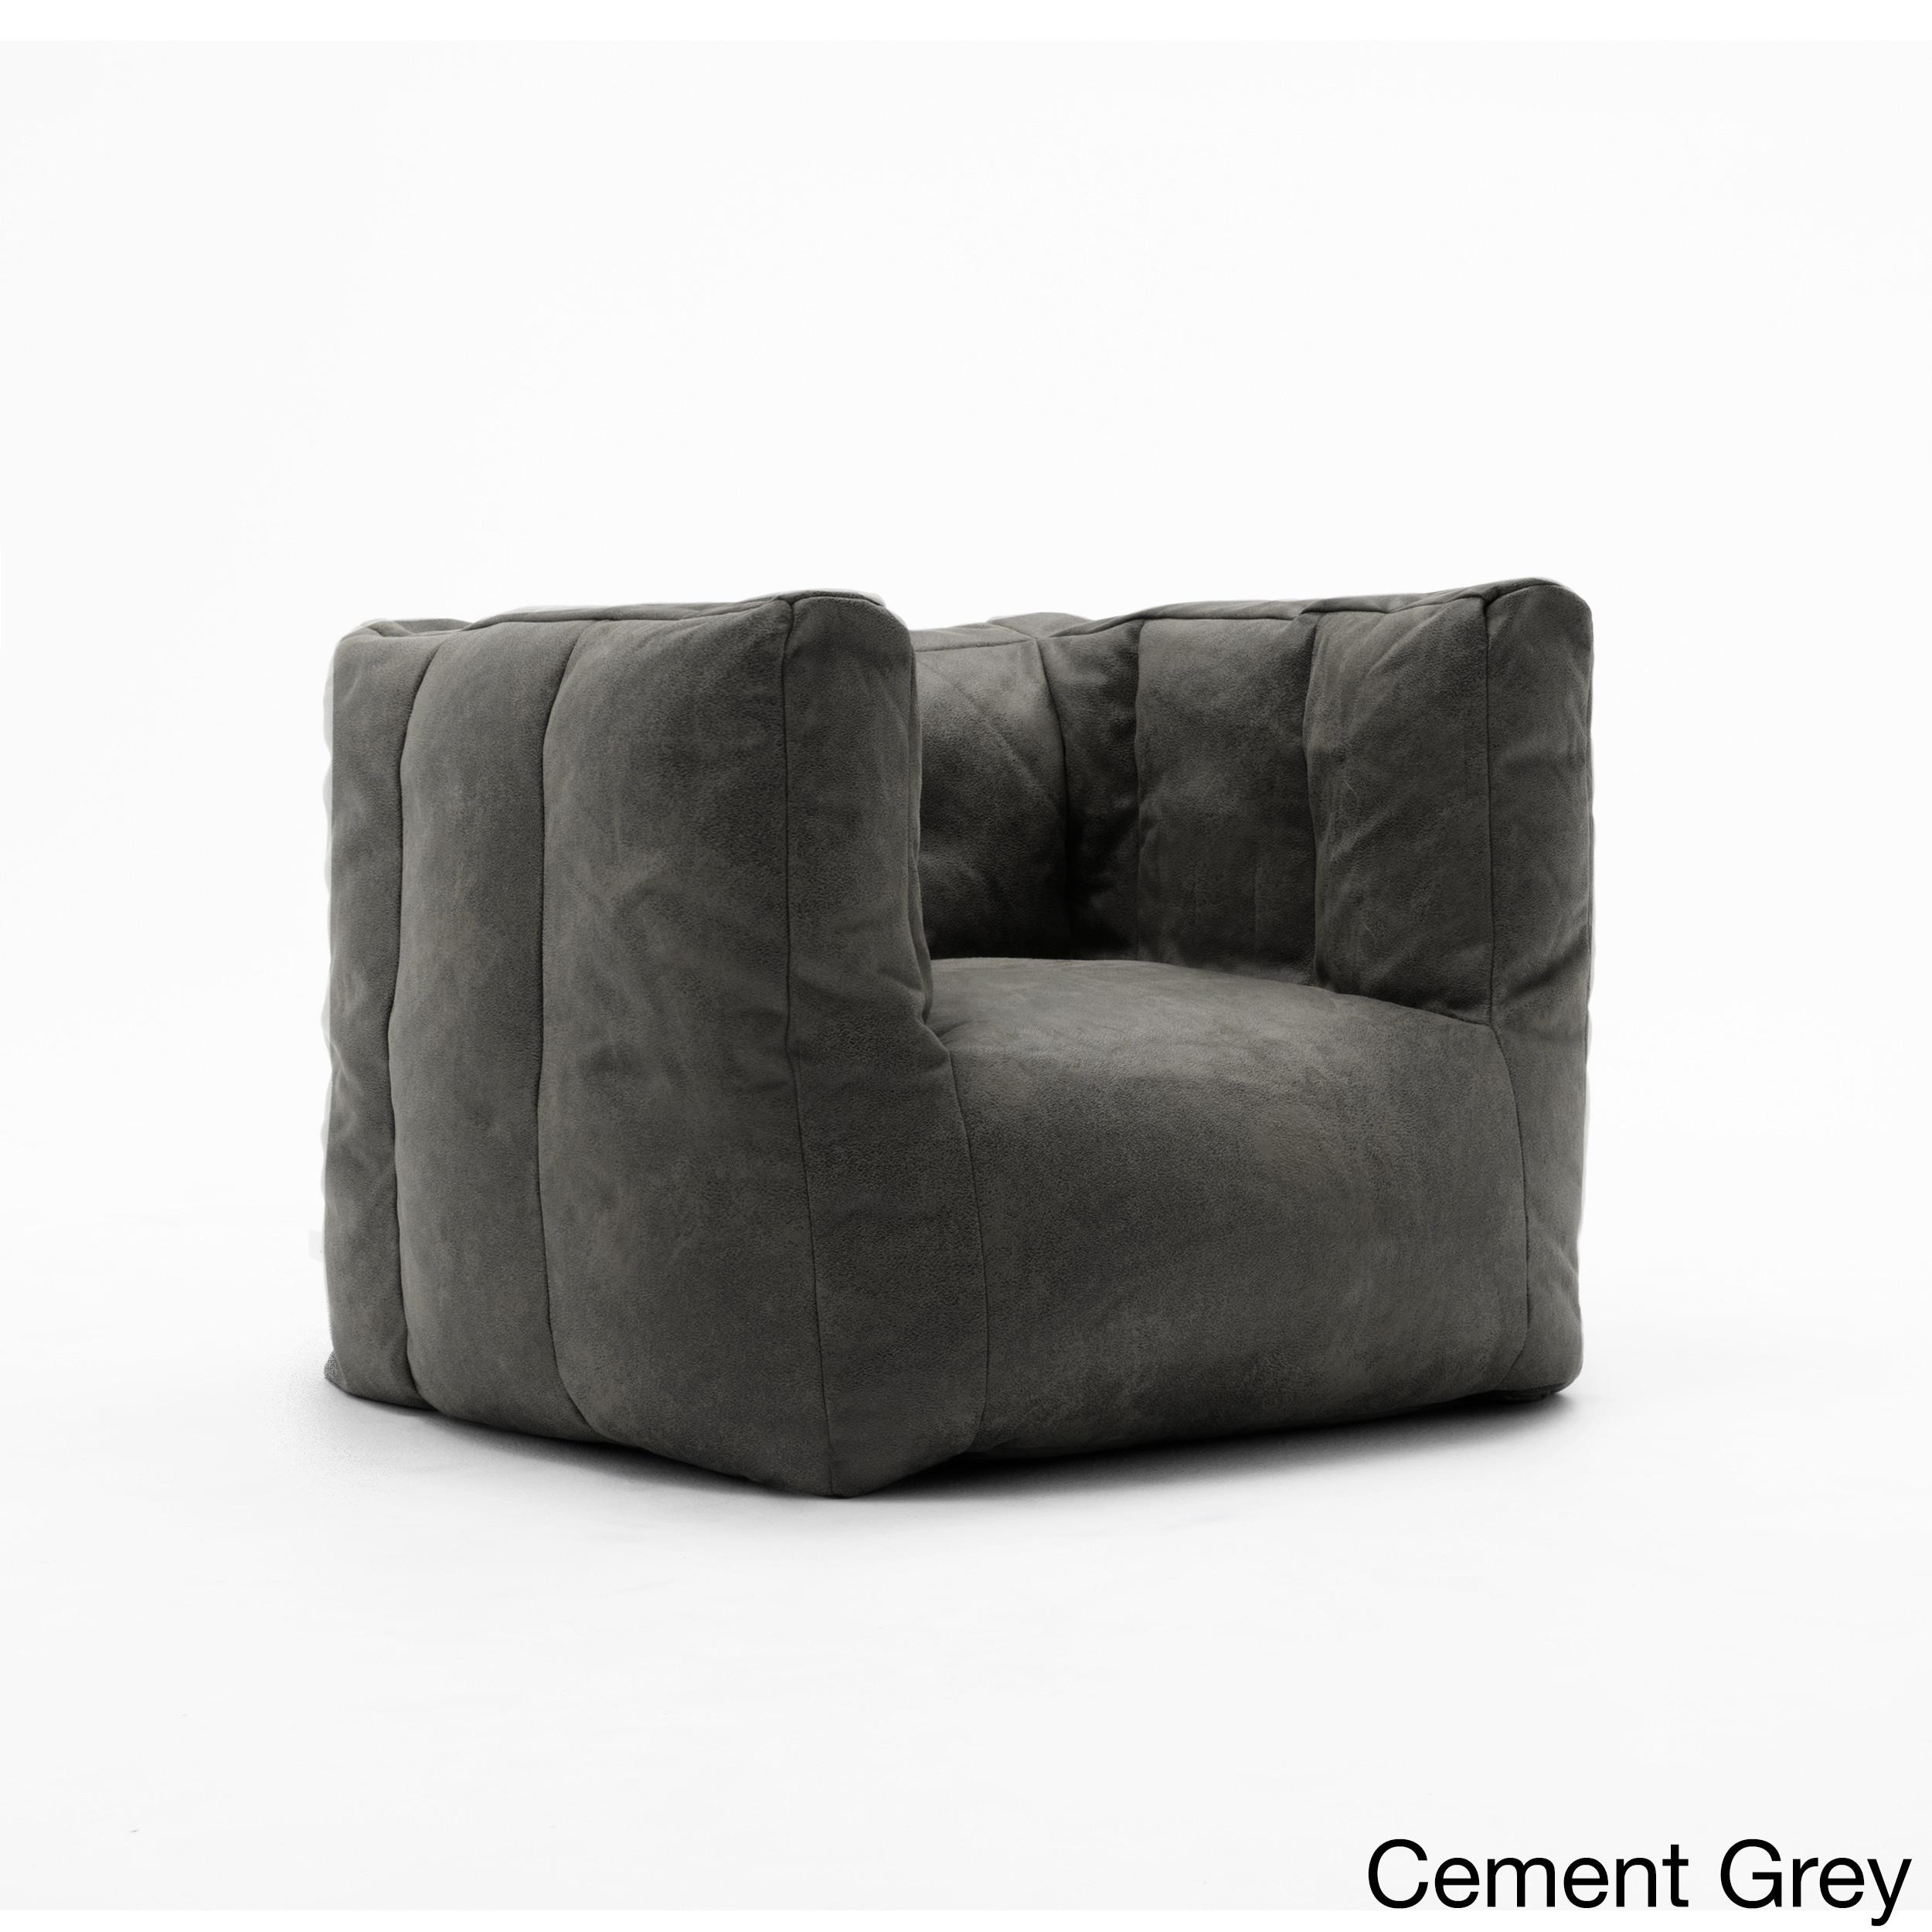 BeanSack Big Joe Lux Microsuede Square Bean Bag Chair (Ce...